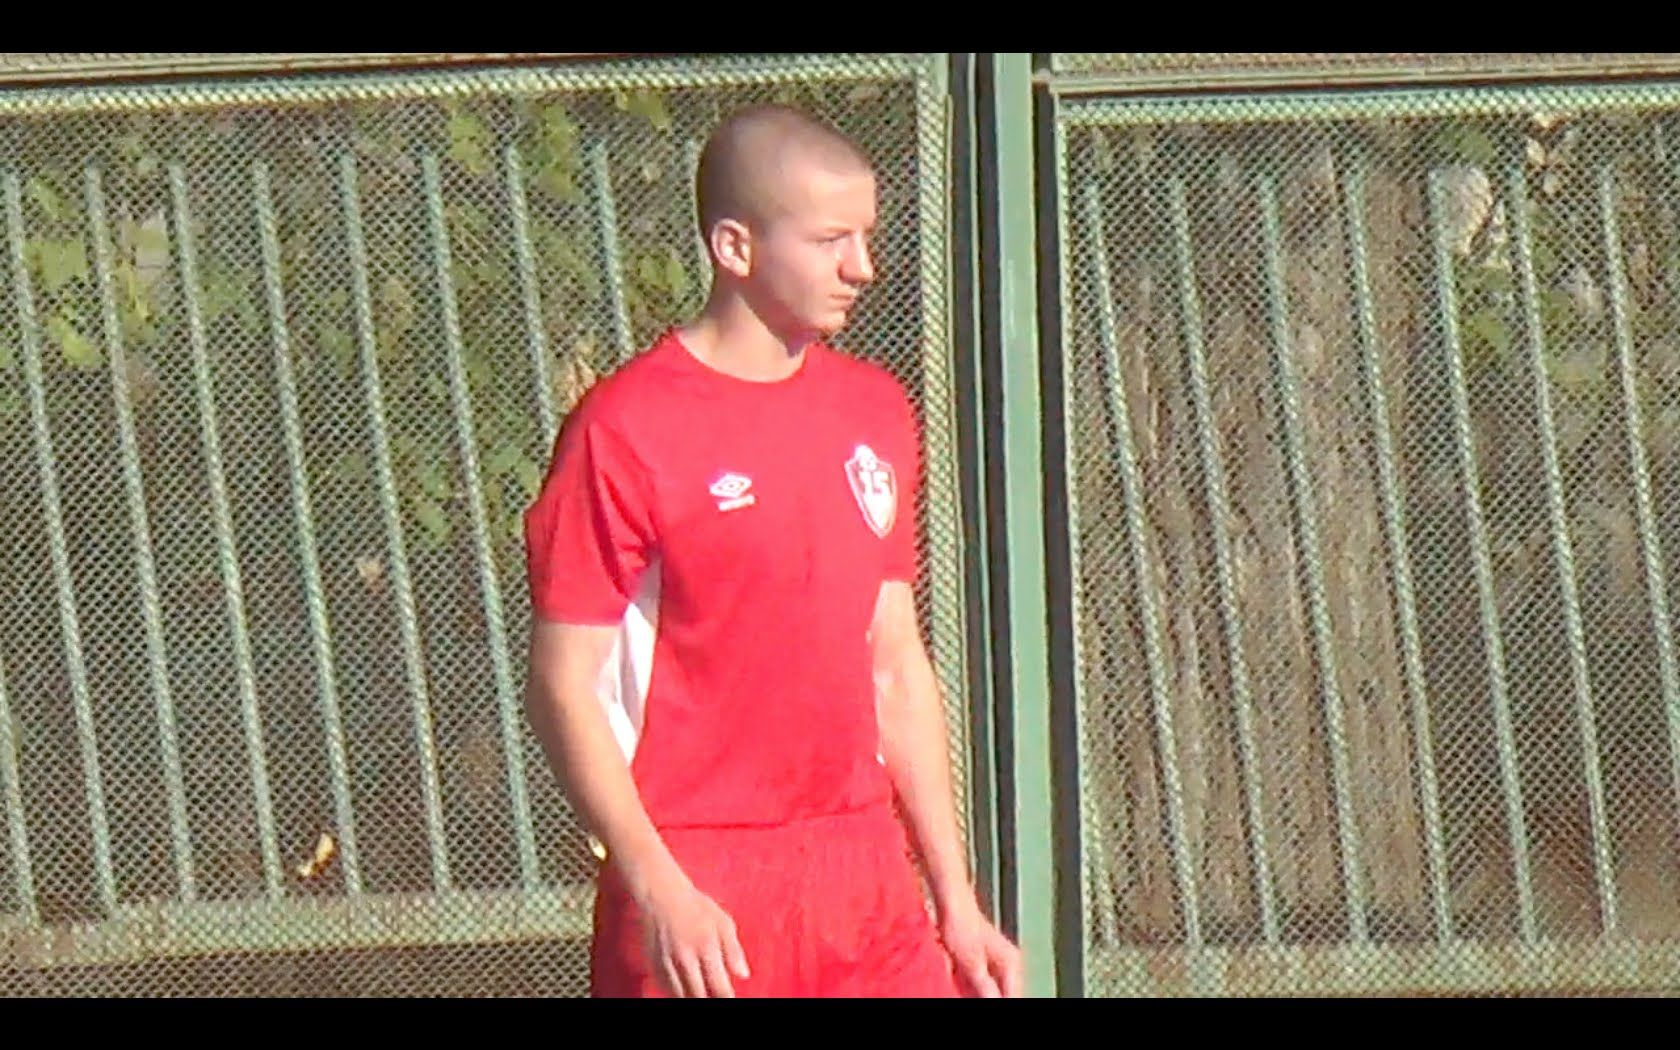 Goal by Maksym Zinatullin to FC Dynamo Kyiv. assist by Oleksiy Bryzhenko